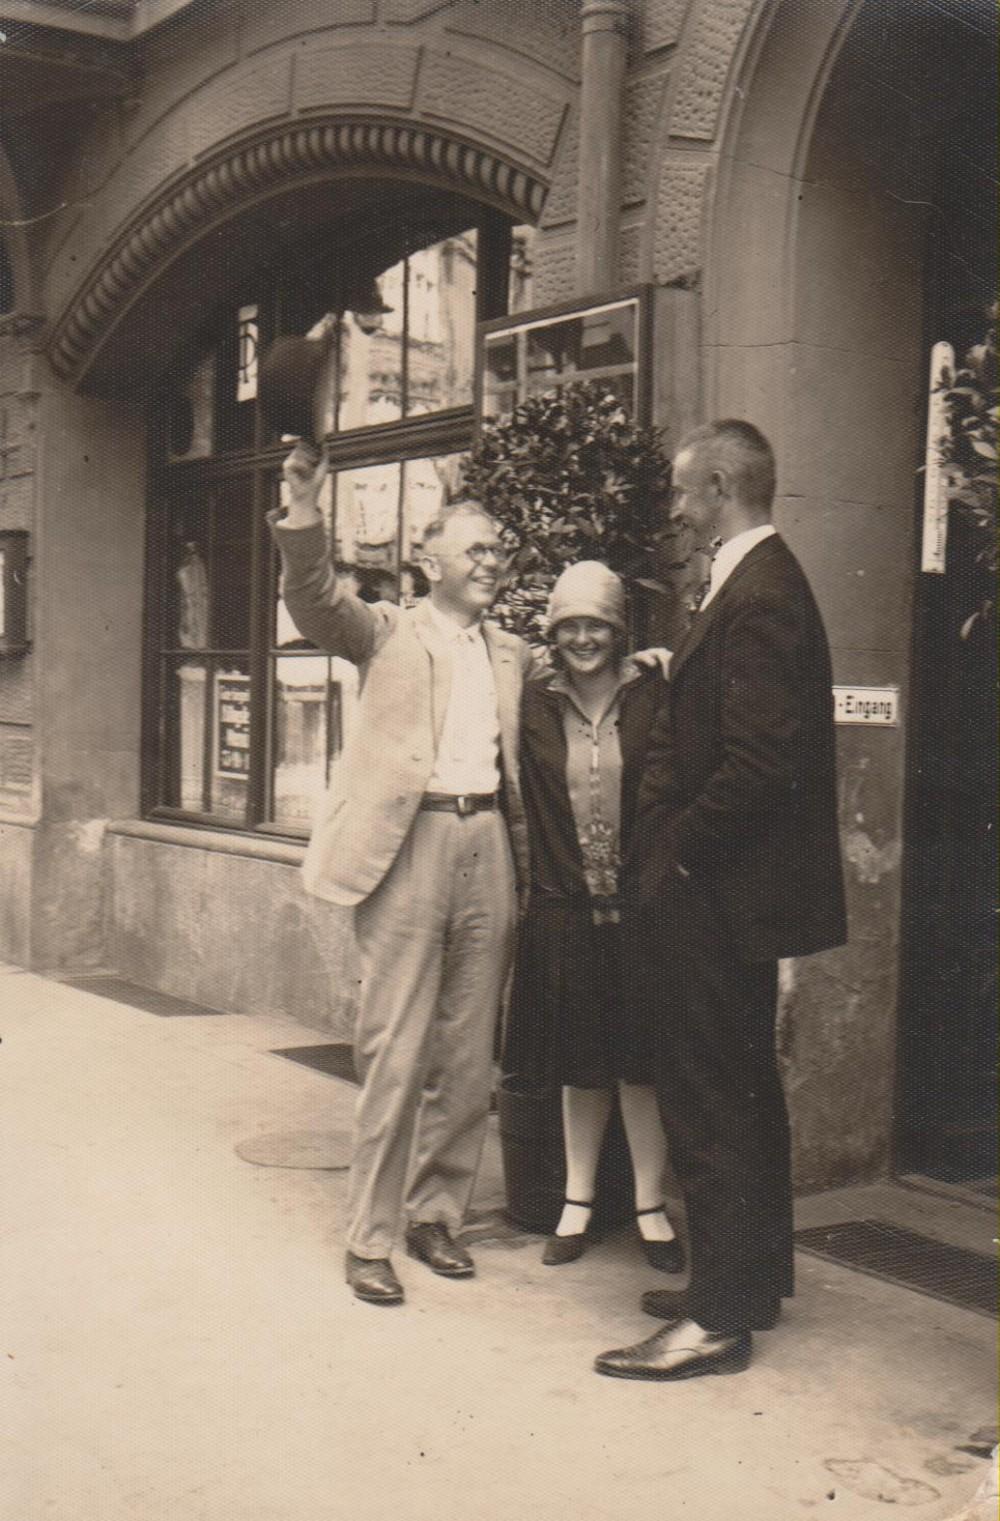 Dr. Erich Miuller Kamp, V. Sruogienė, B. Sruoga. Miunchenas, 1928 m. liepa